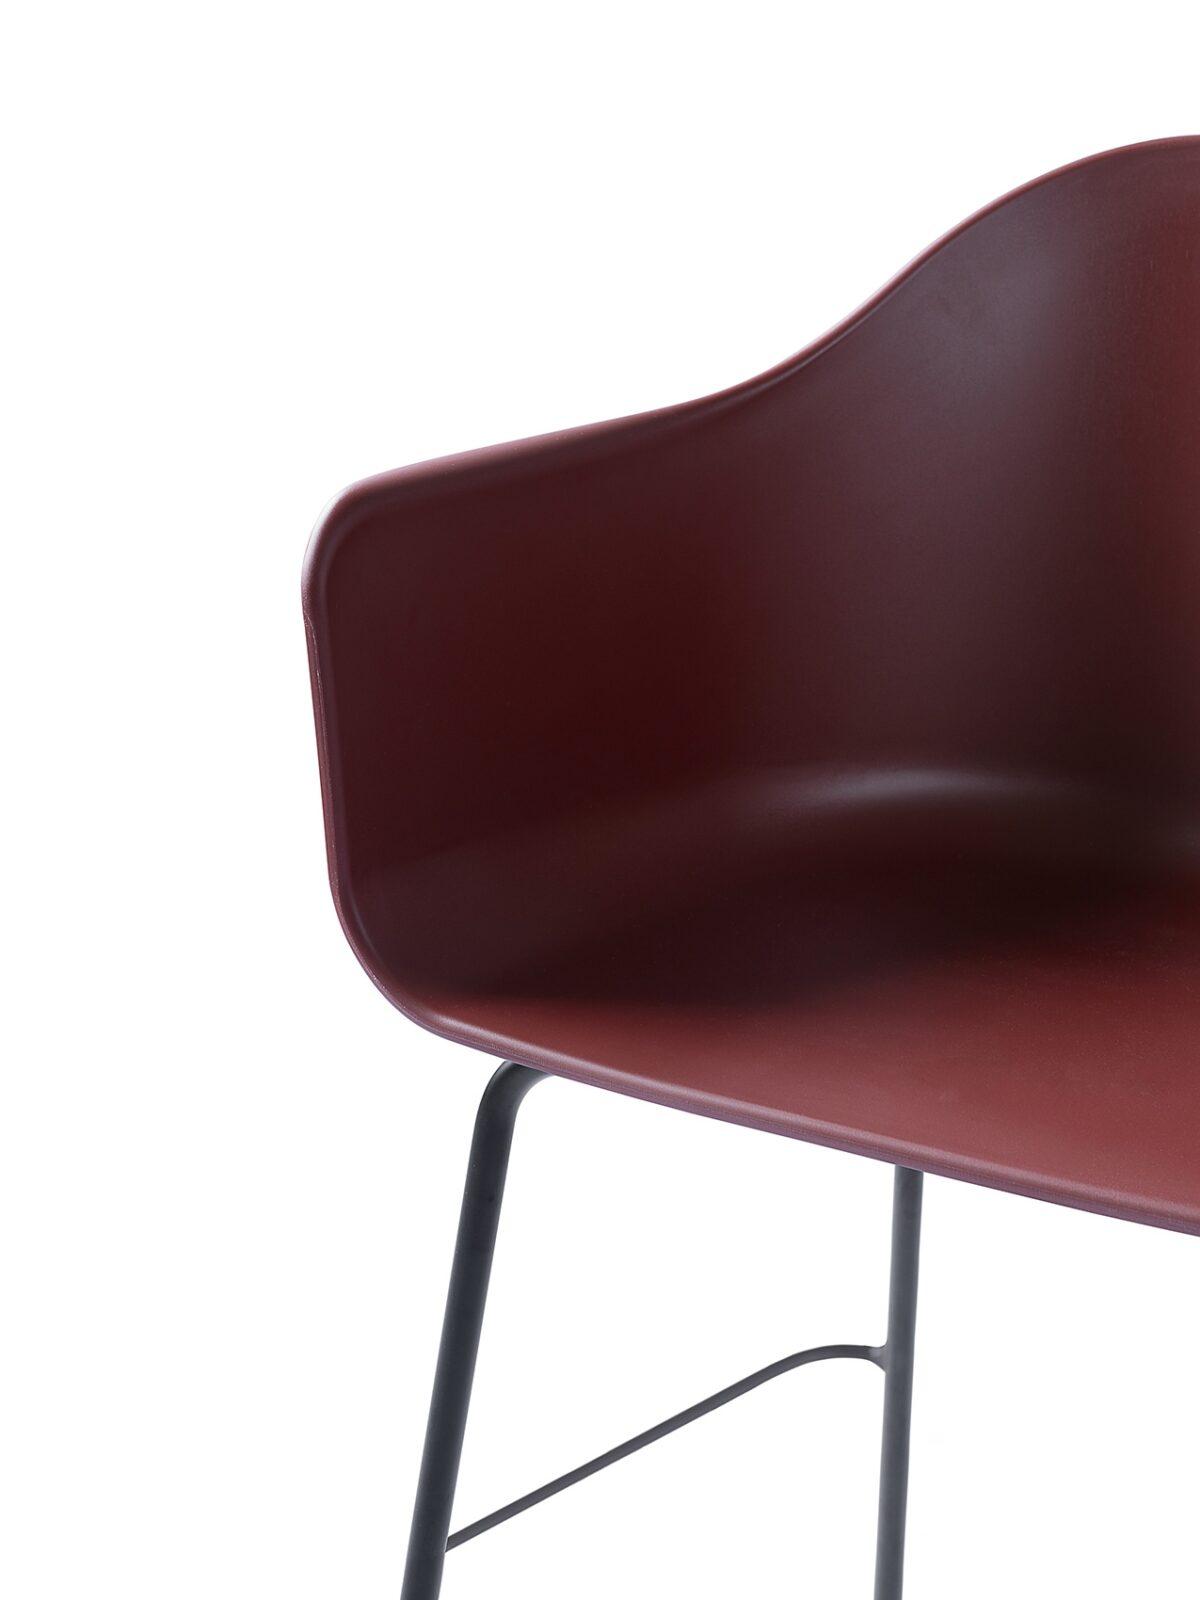 9365349 Harbour Chair counter burndred Black Detail